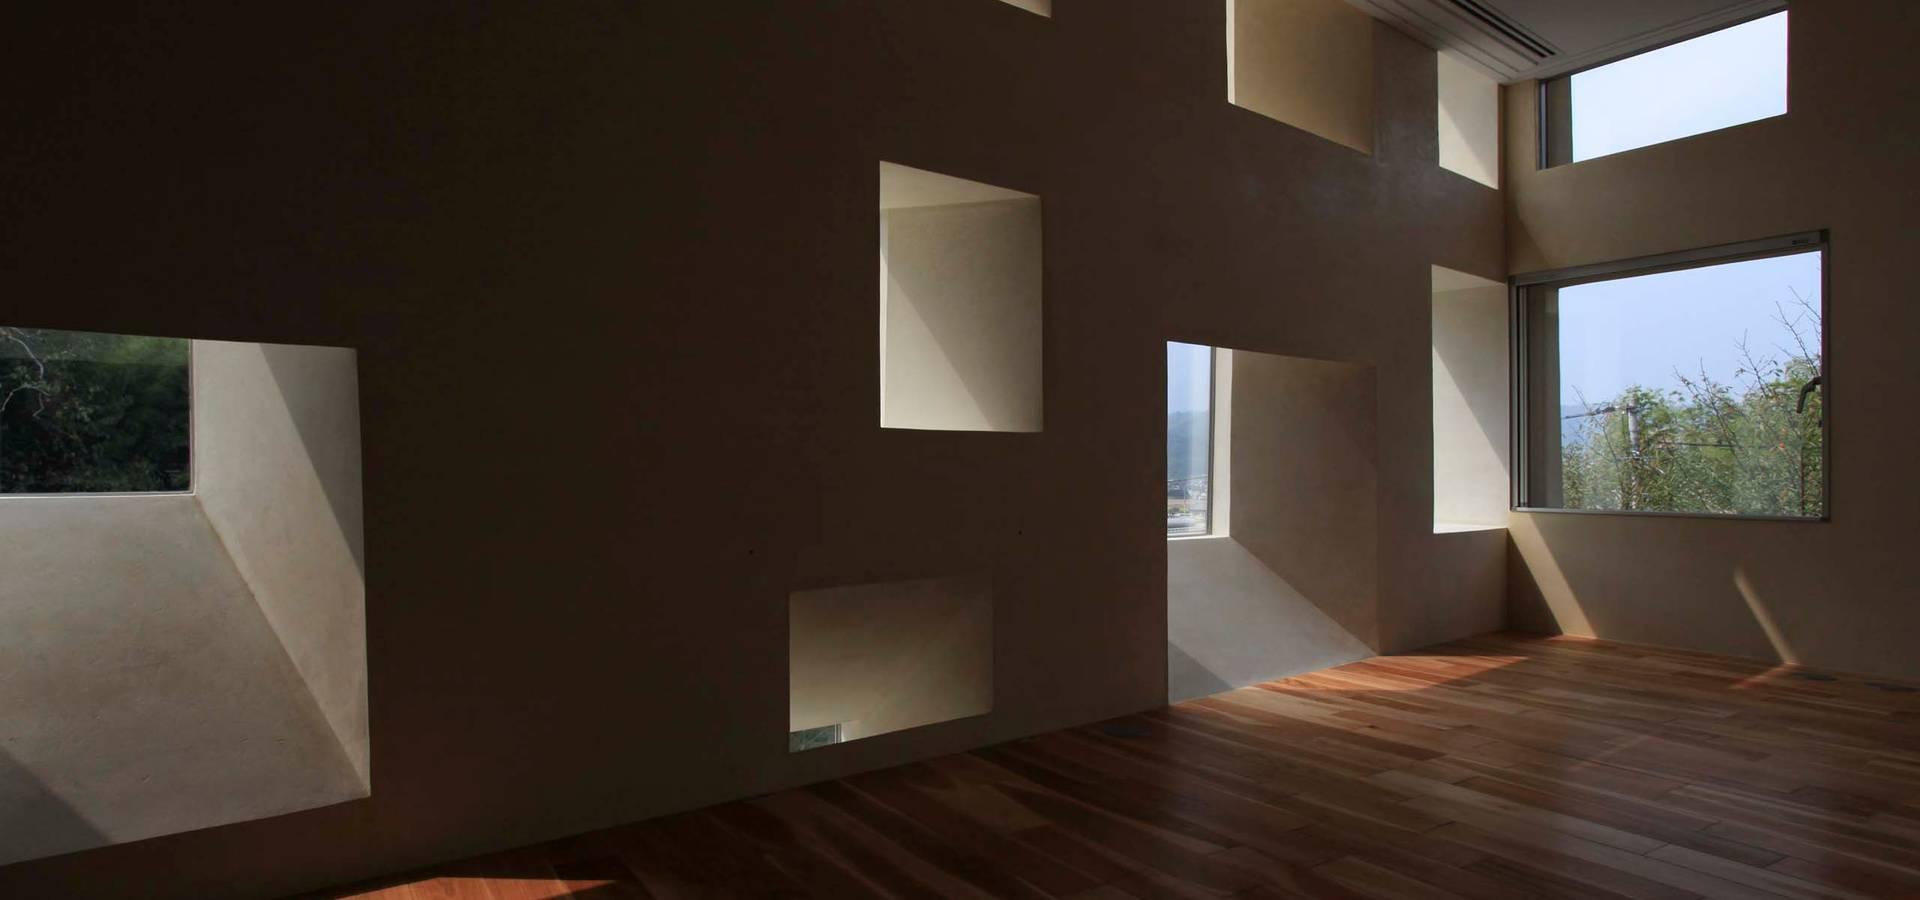 Zai SHIRAKAWA Architects & Associates / 白川在建築設計事務所